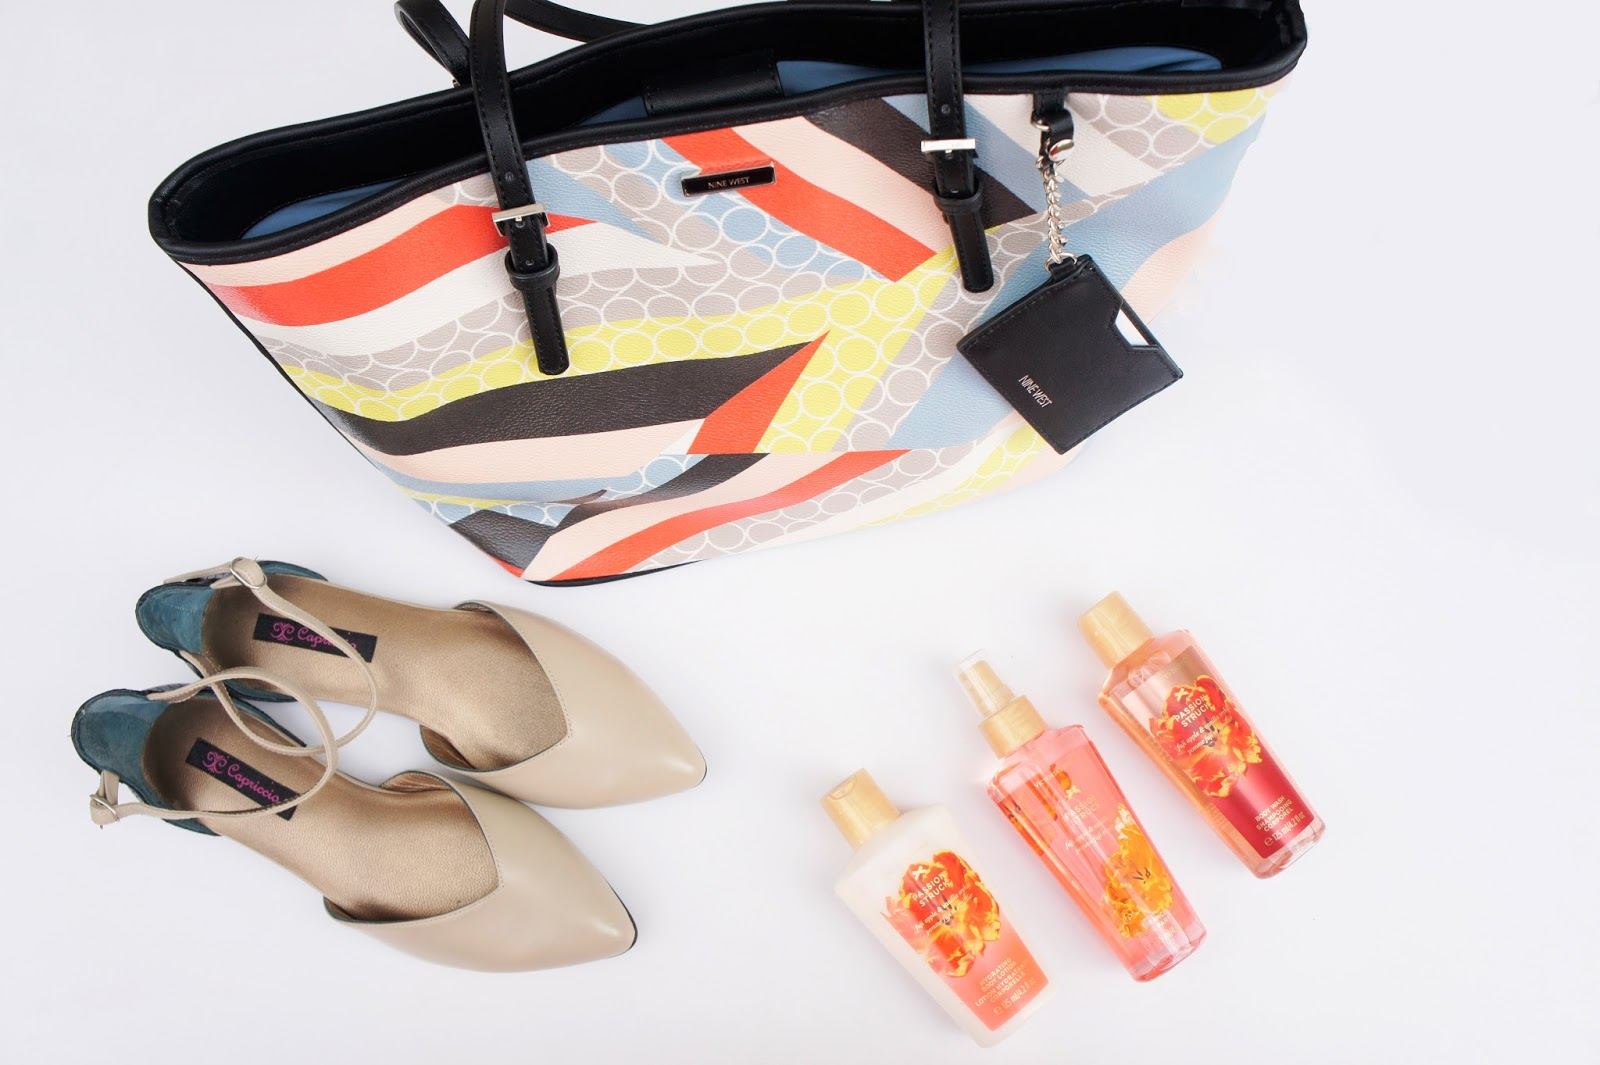 Balerinas Capriccio - Cartera Nine West - Perfumes Victoria Secret